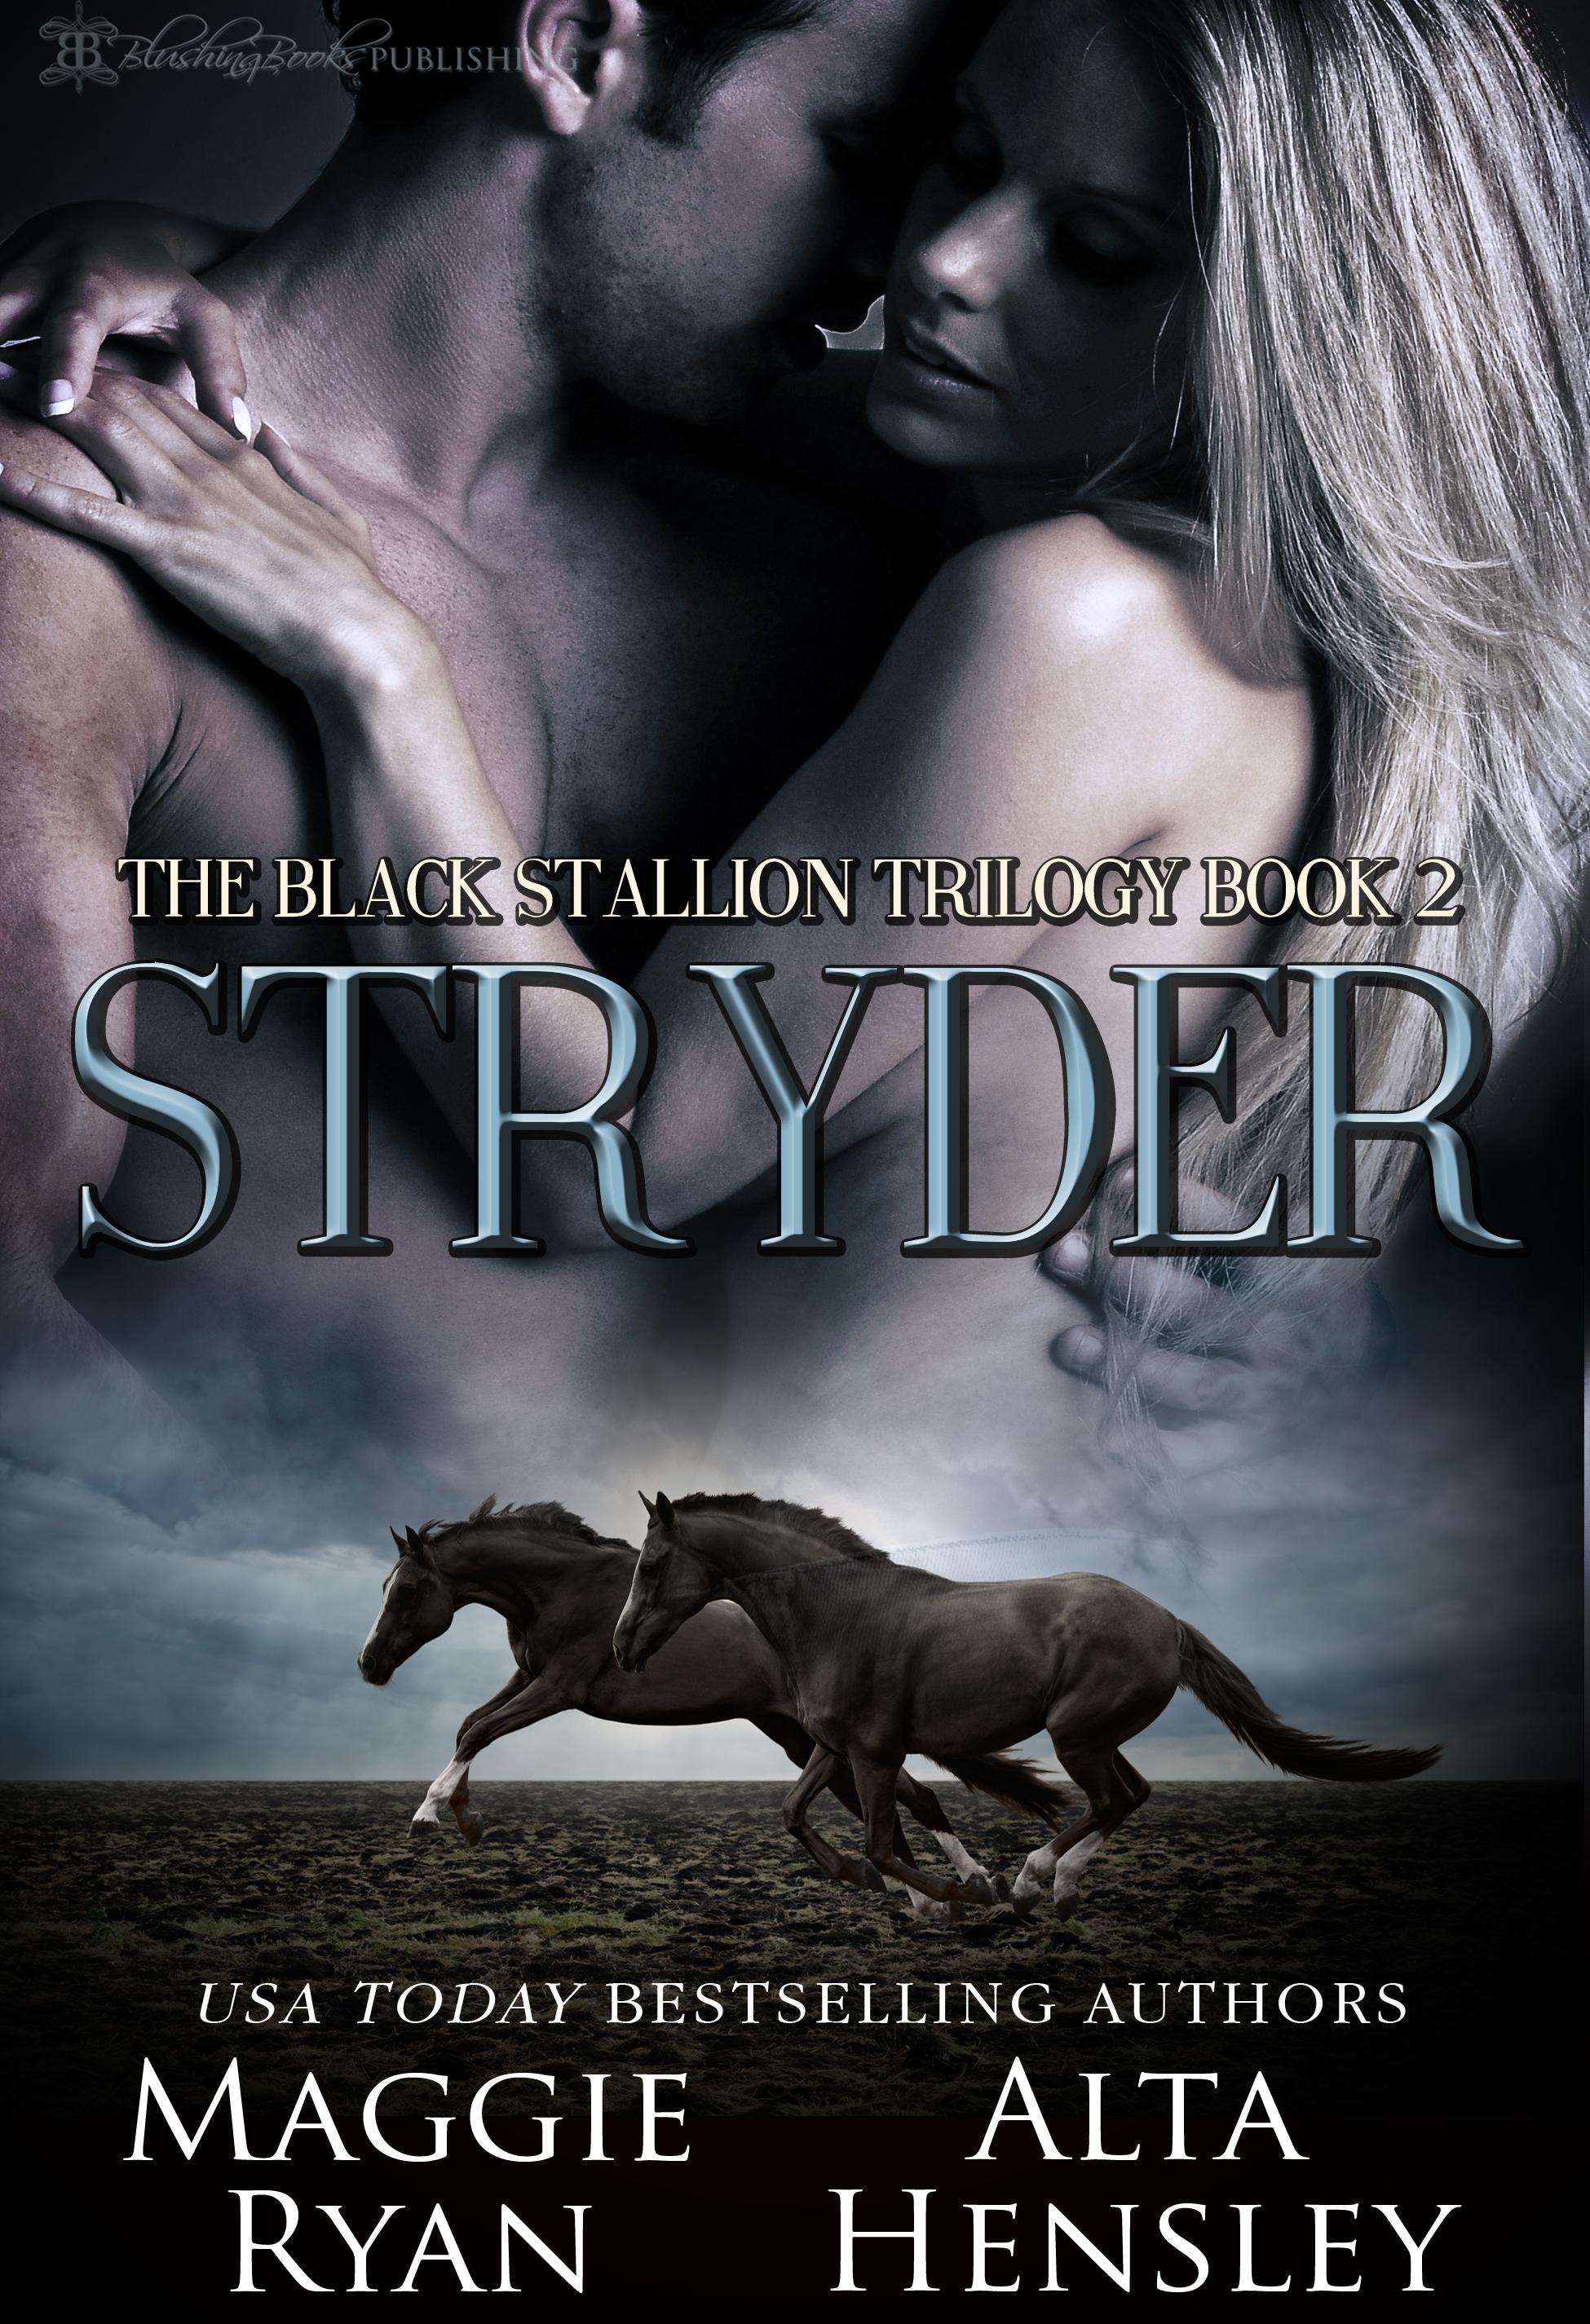 Stryder by Alta Hensley, Maggie Ryan